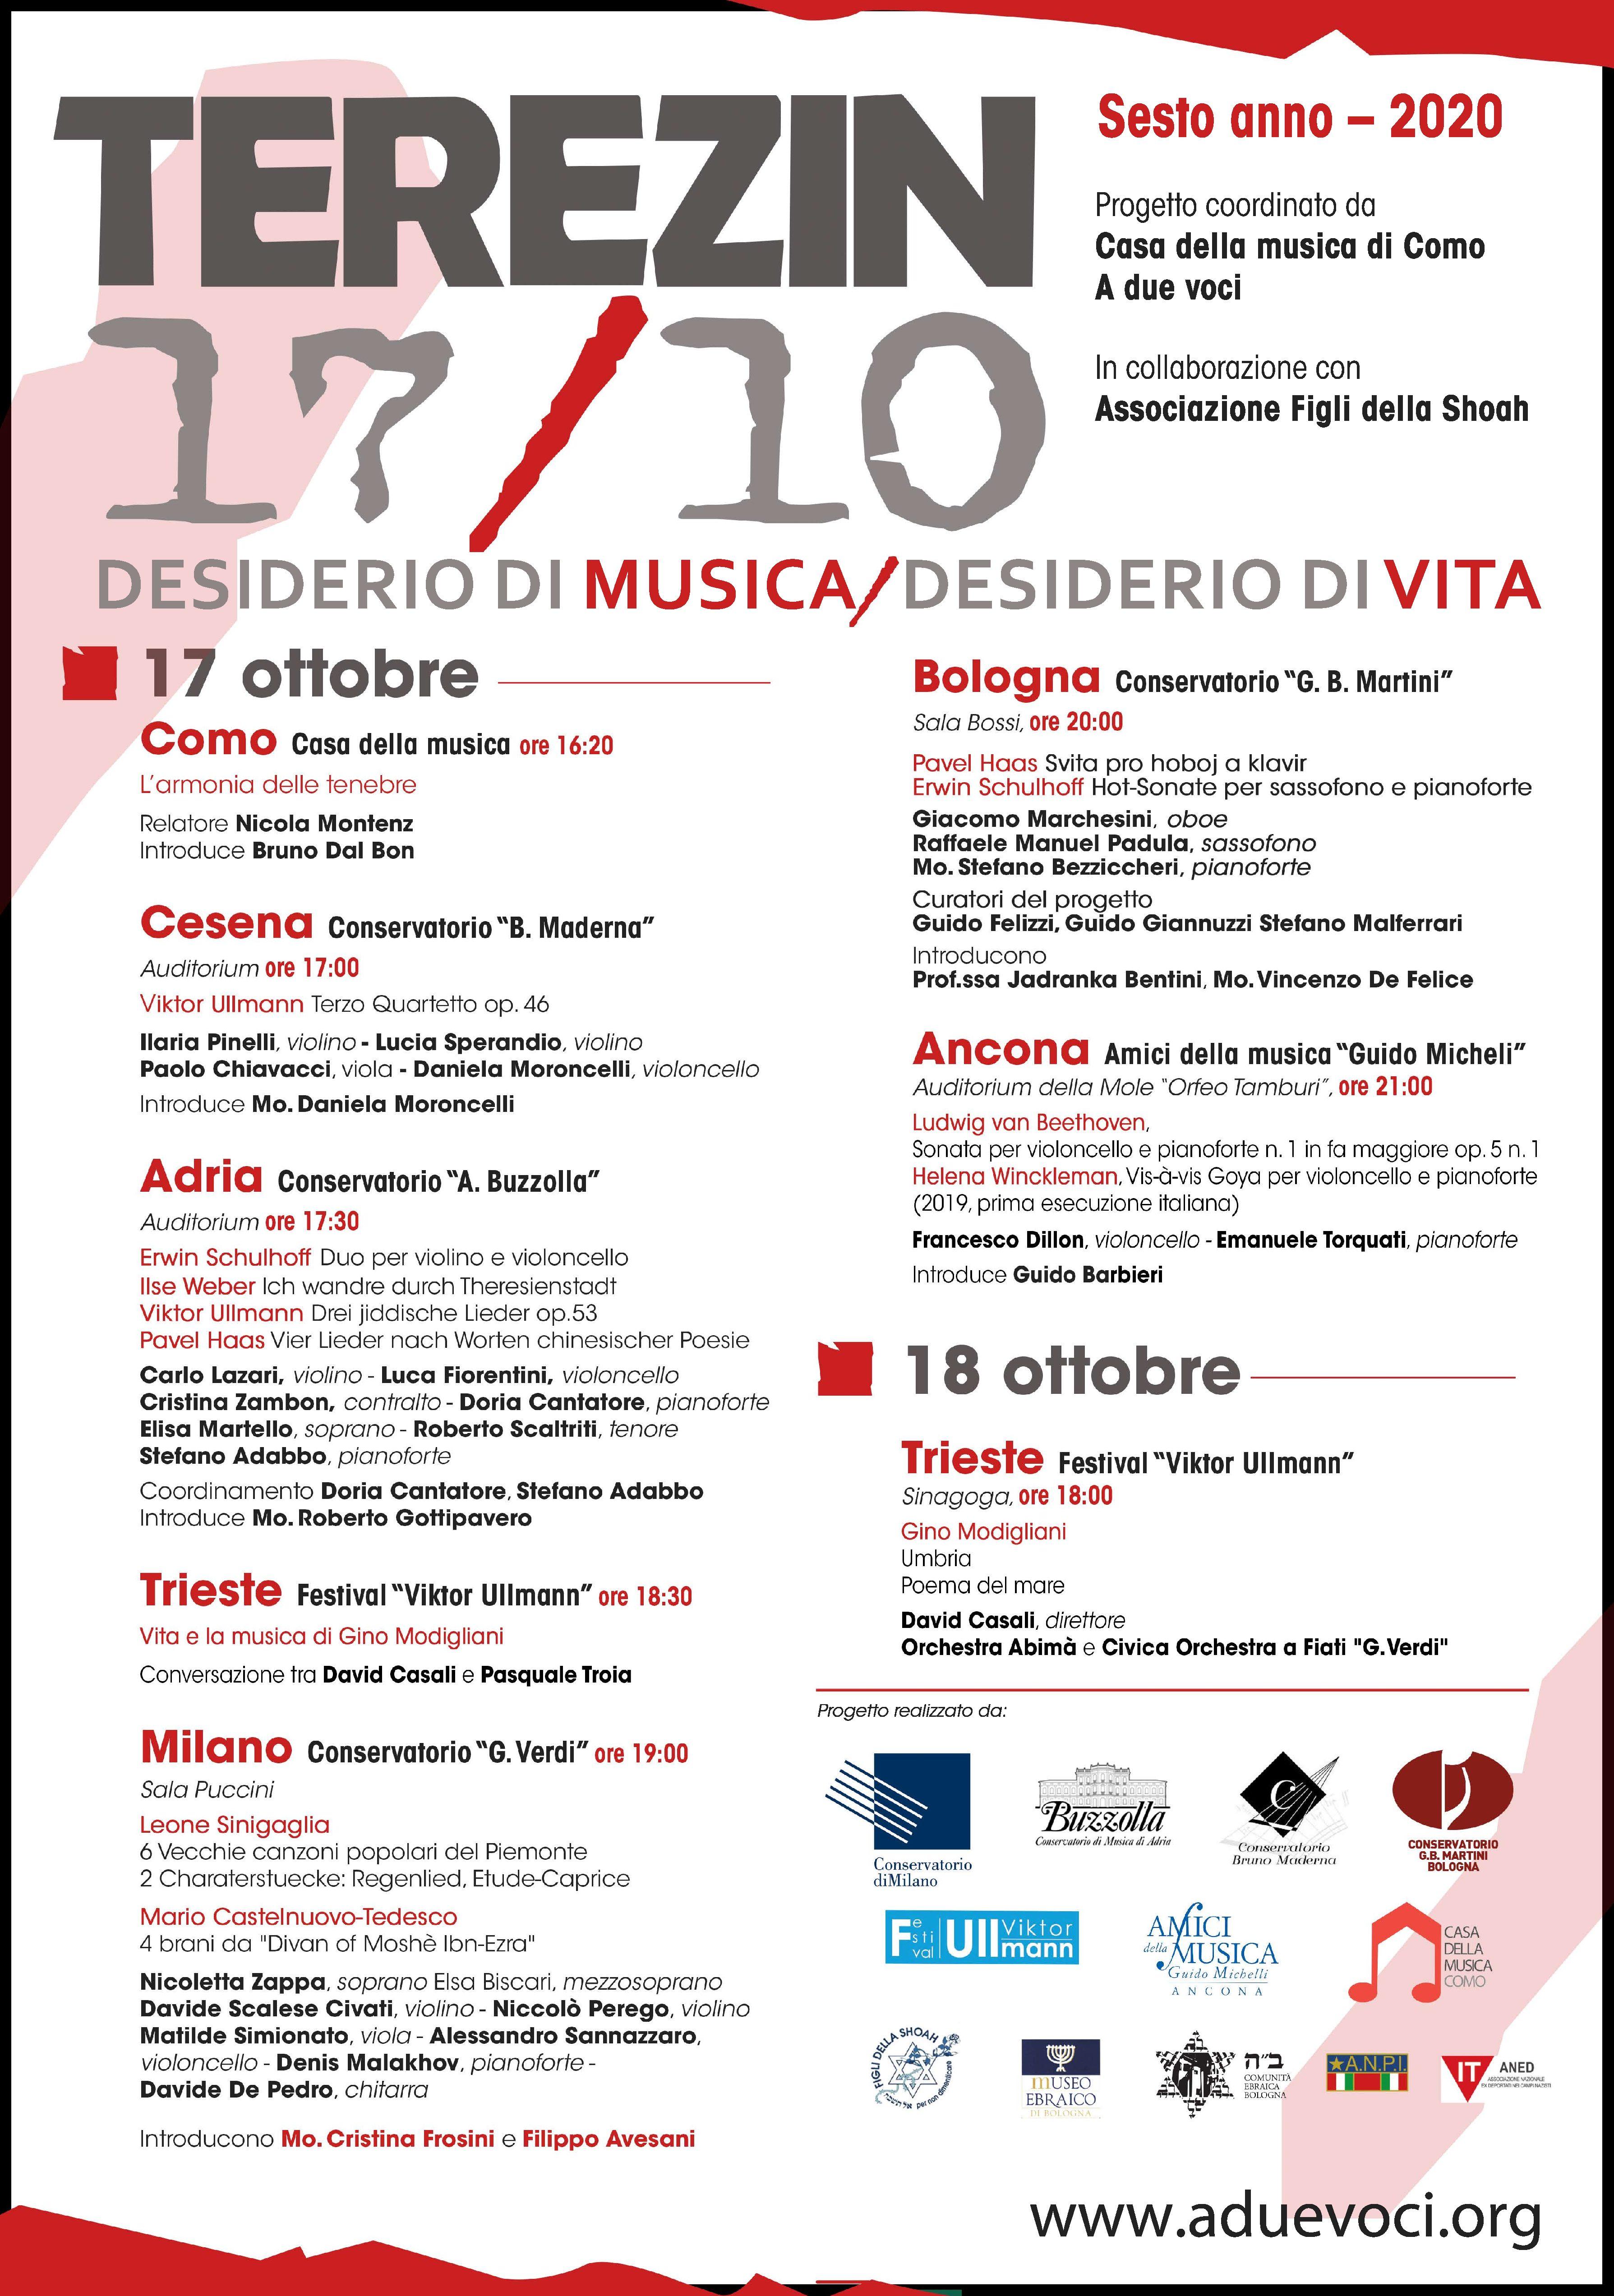 17 ottobre 2020 – Concerto per Terezin – Auditorium del Conservatorio